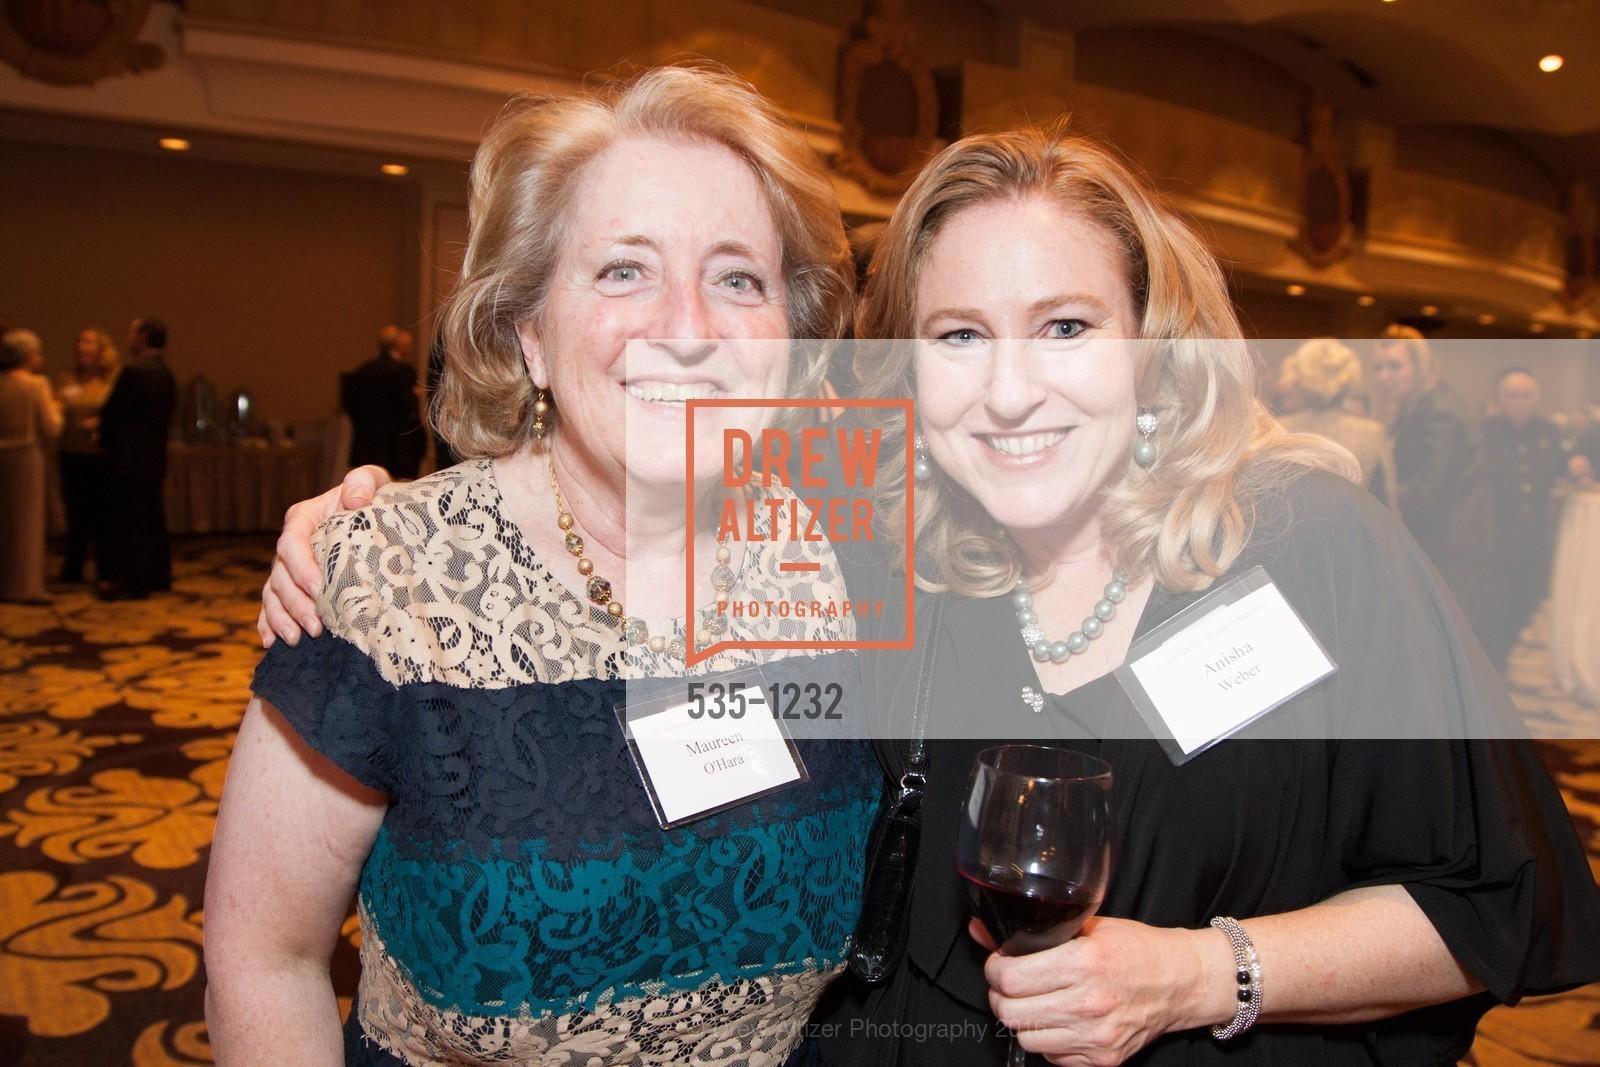 Maureen O'Hara, Anisha Weber, Photo #535-1232